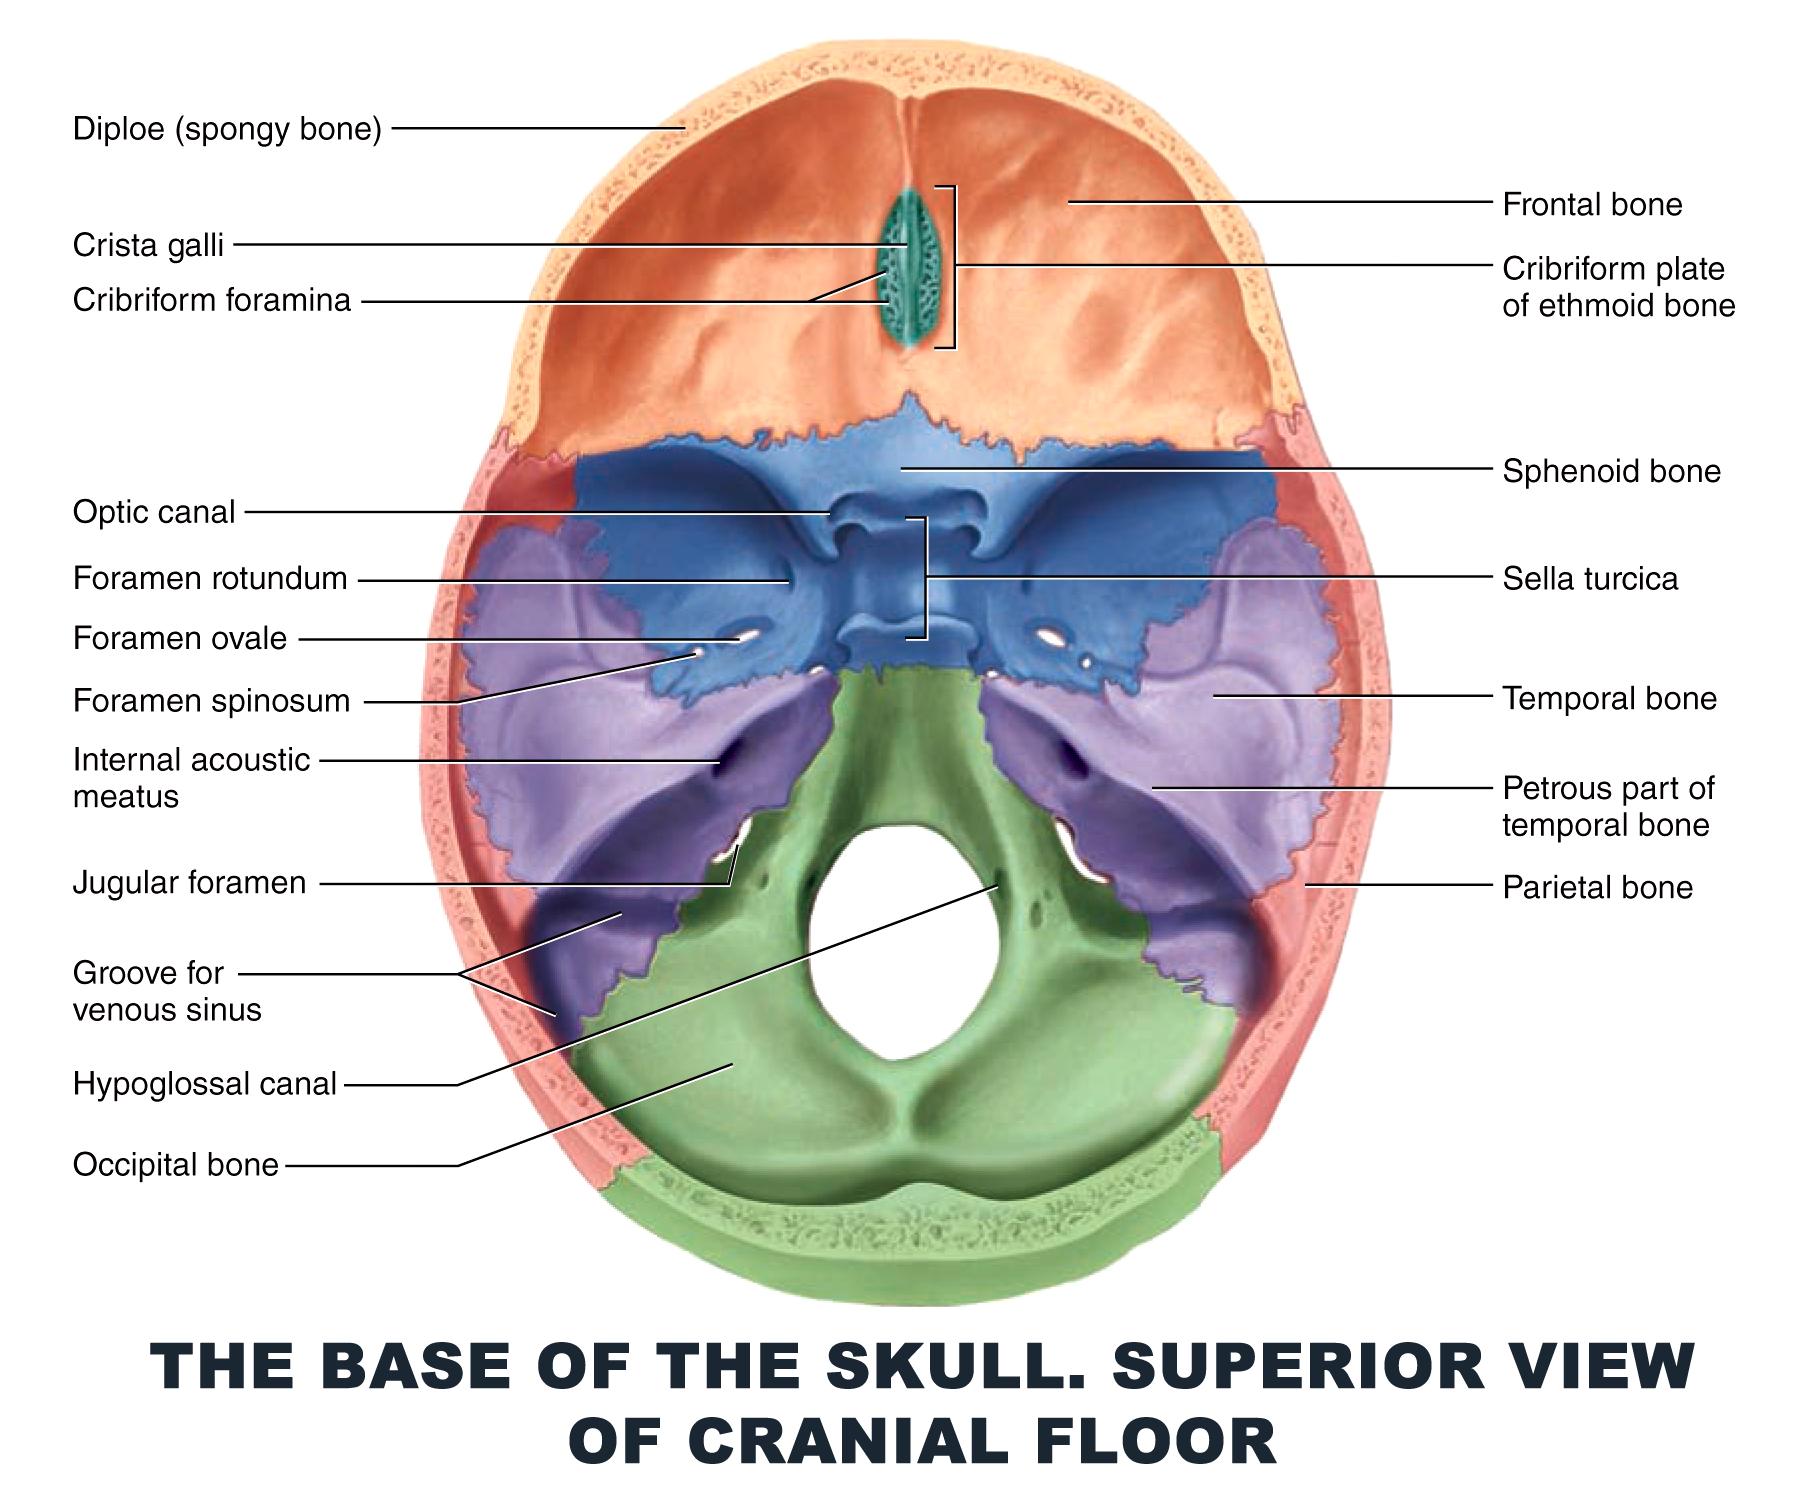 Floor Of Cranial Cavity Diagram | Wikizie.co